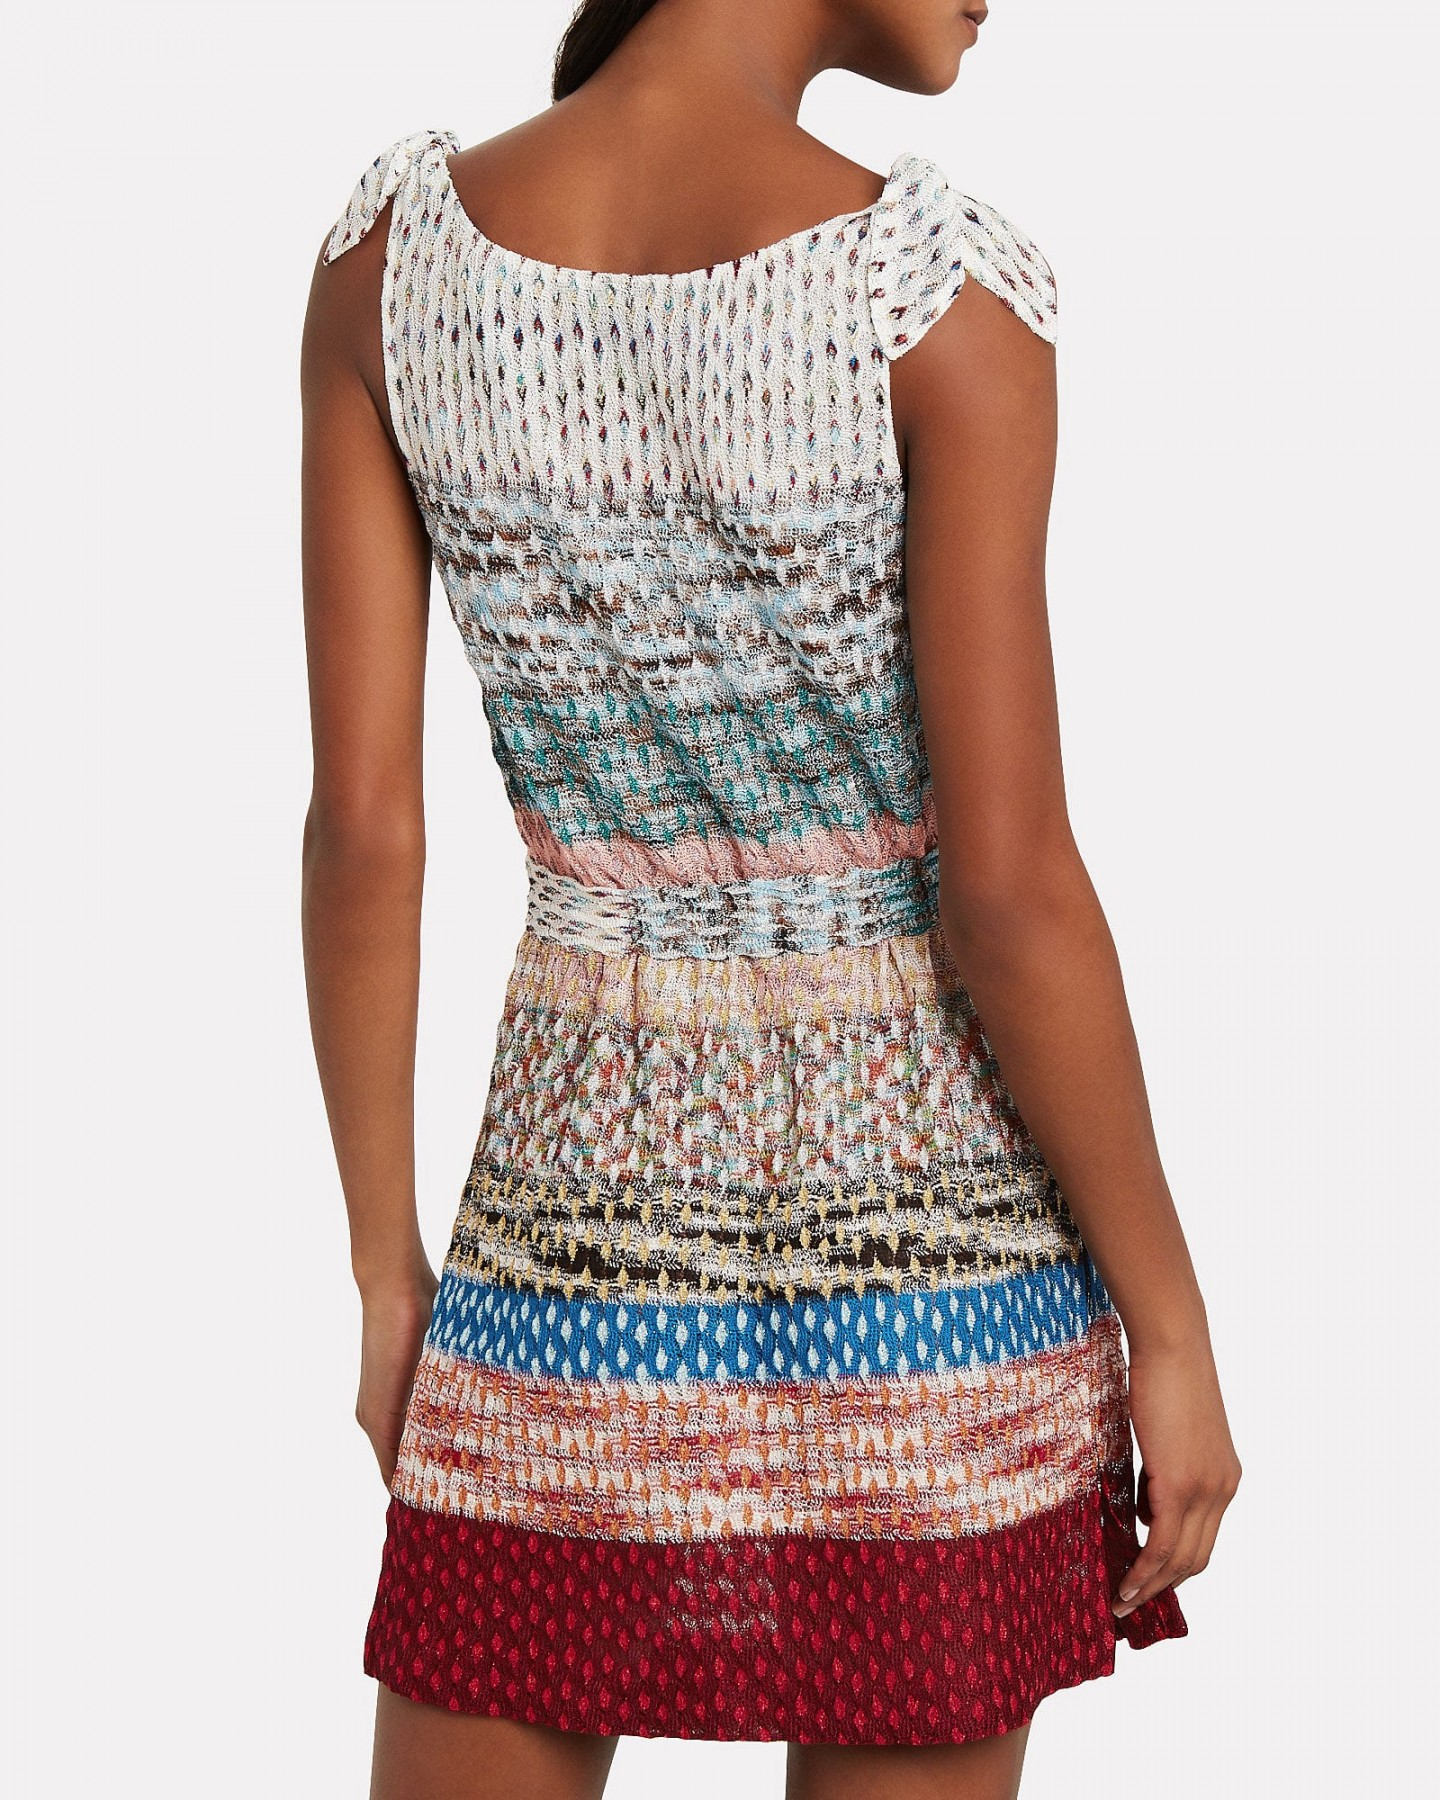 MISSONI MARE Colorblock Knit Tie Waist Dress